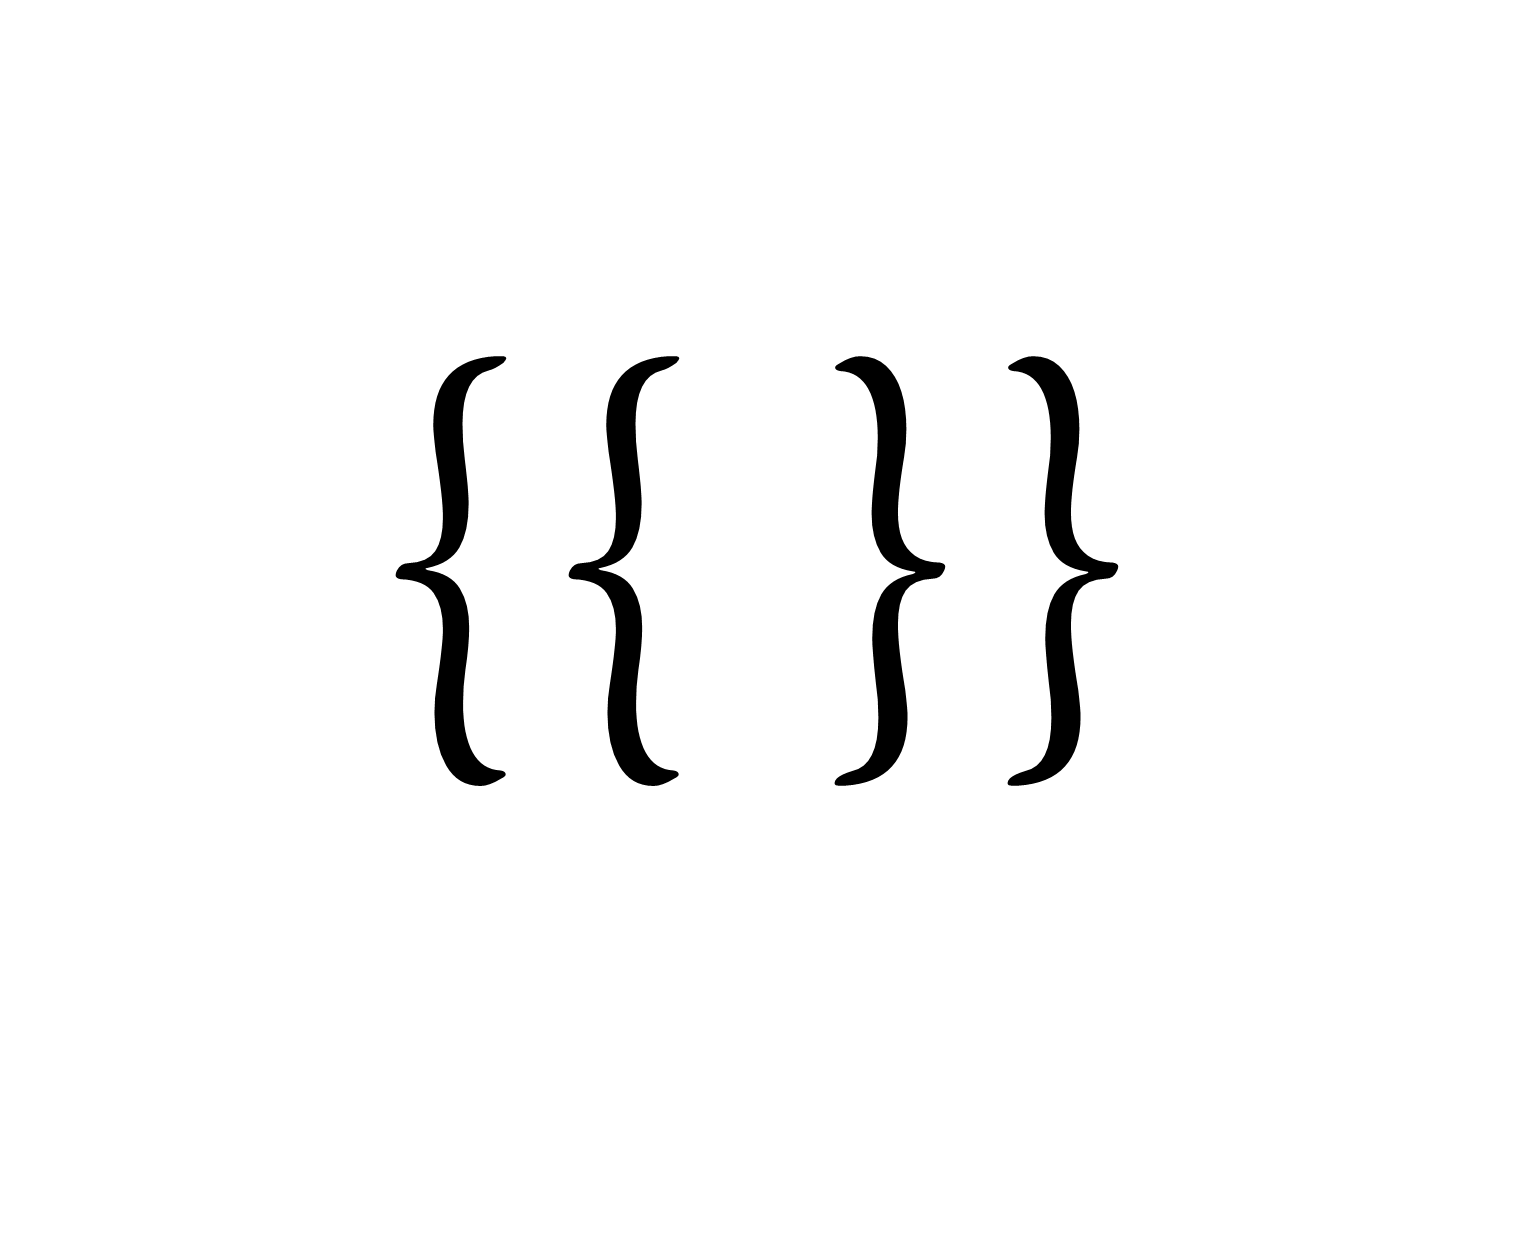 Archivo:Plantilla wiki.png - Wikipedia, la enciclopedia libre